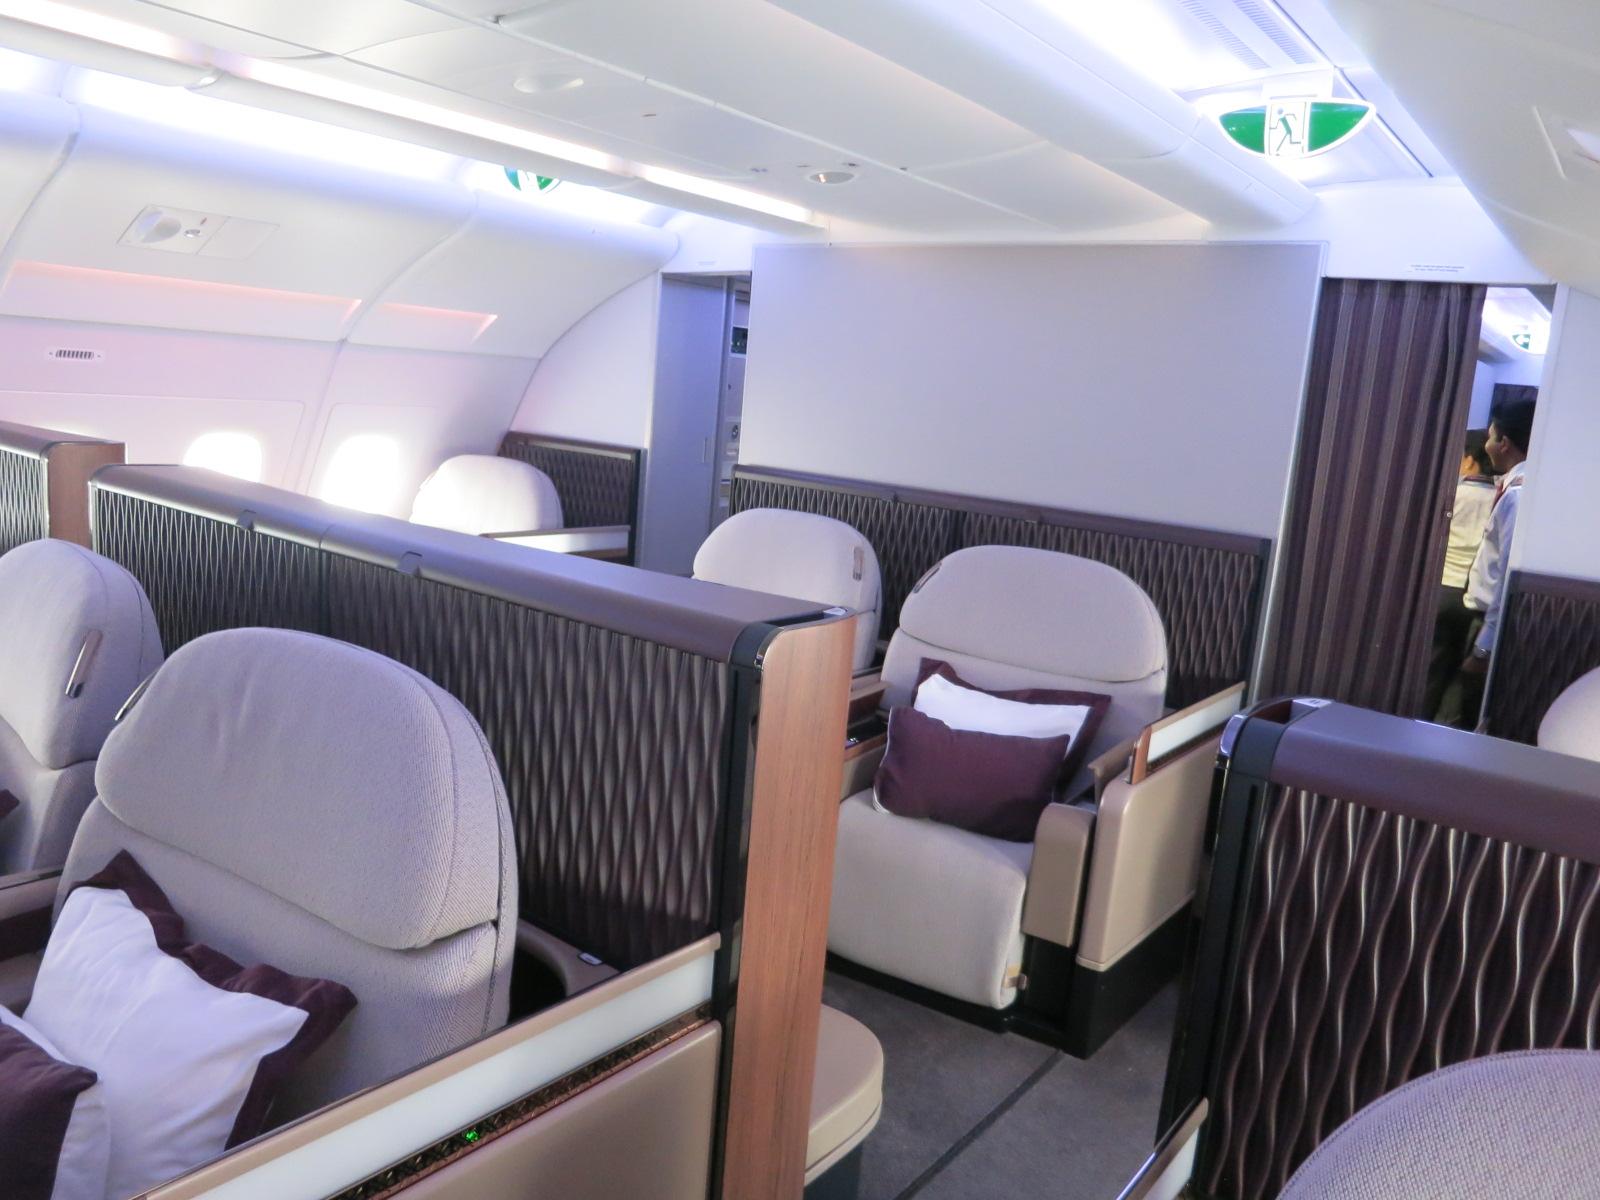 Qatar Airways A380 first class cabin Bangkok-Doha